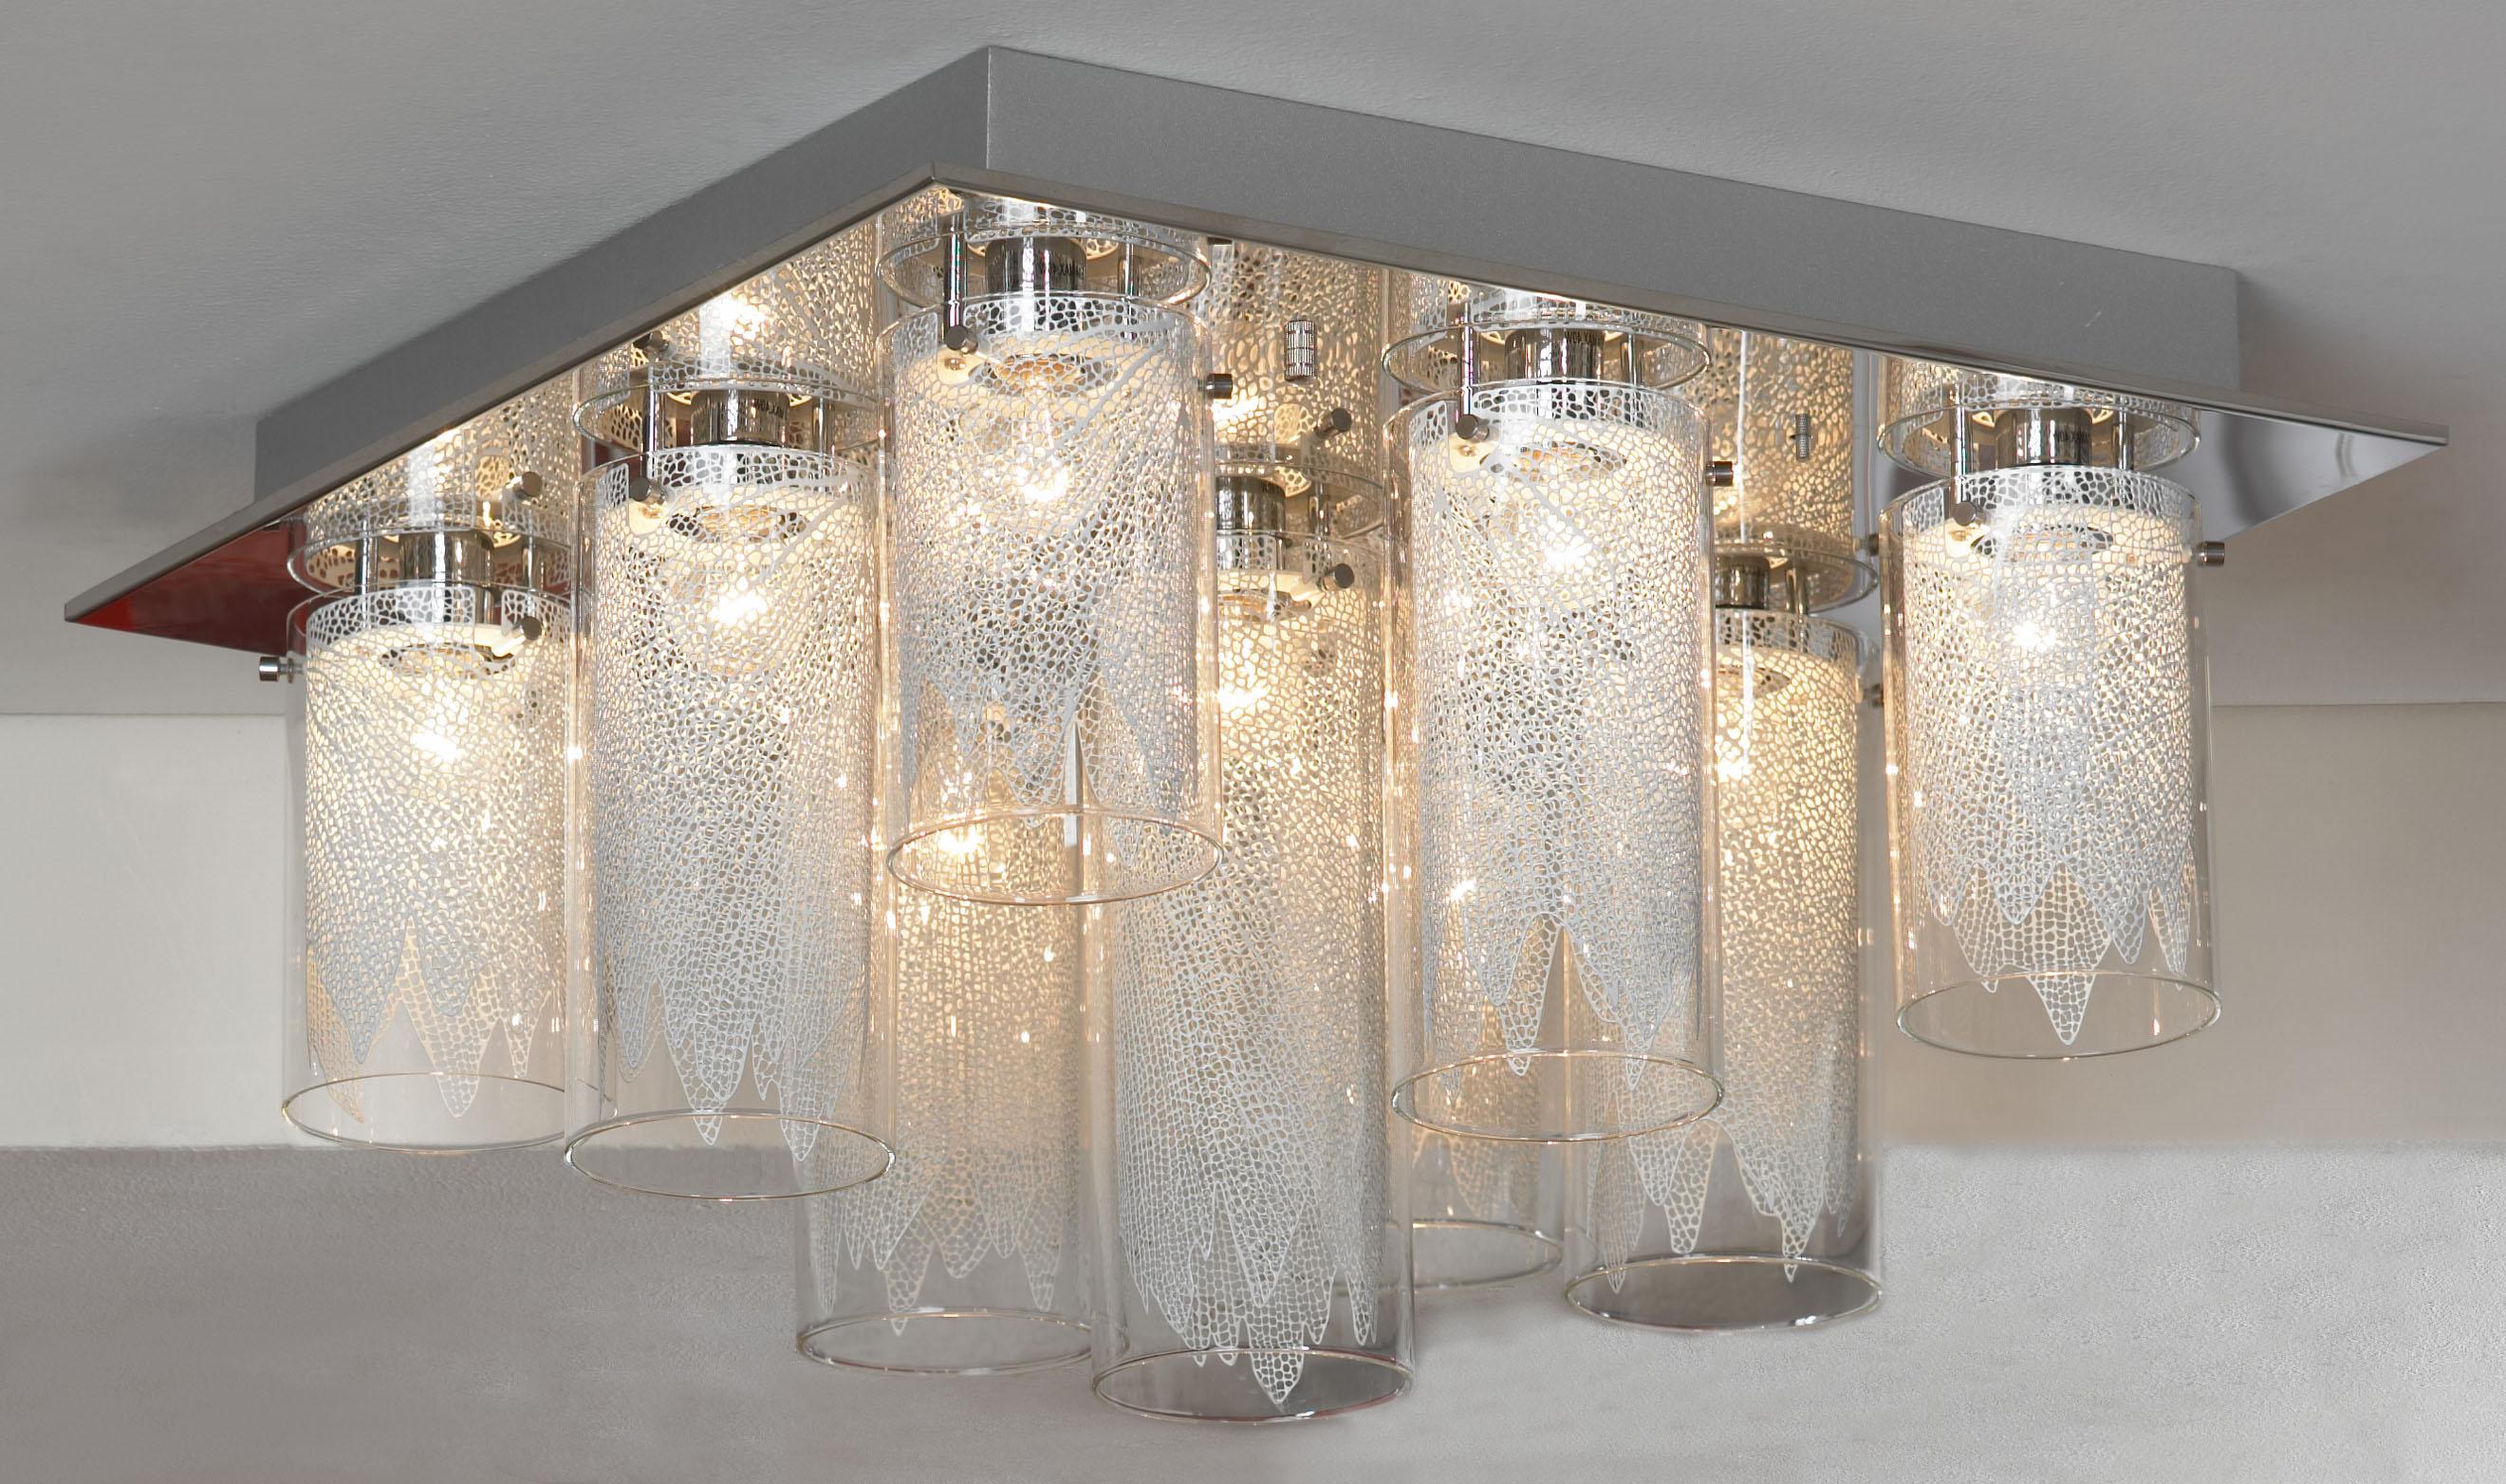 Люстра LussoleЛюстры<br>Назначение светильника: для гостиной,<br>Стиль светильника: модерн,<br>Тип: потолочная,<br>Материал светильника: металл, стекло,<br>Материал плафона: стекло,<br>Материал арматуры: металл,<br>Длина (мм): 340,<br>Ширина: 540,<br>Количество ламп: 9,<br>Тип лампы: накаливания,<br>Мощность: 40,<br>Патрон: Е14,<br>Цвет арматуры: хром<br>